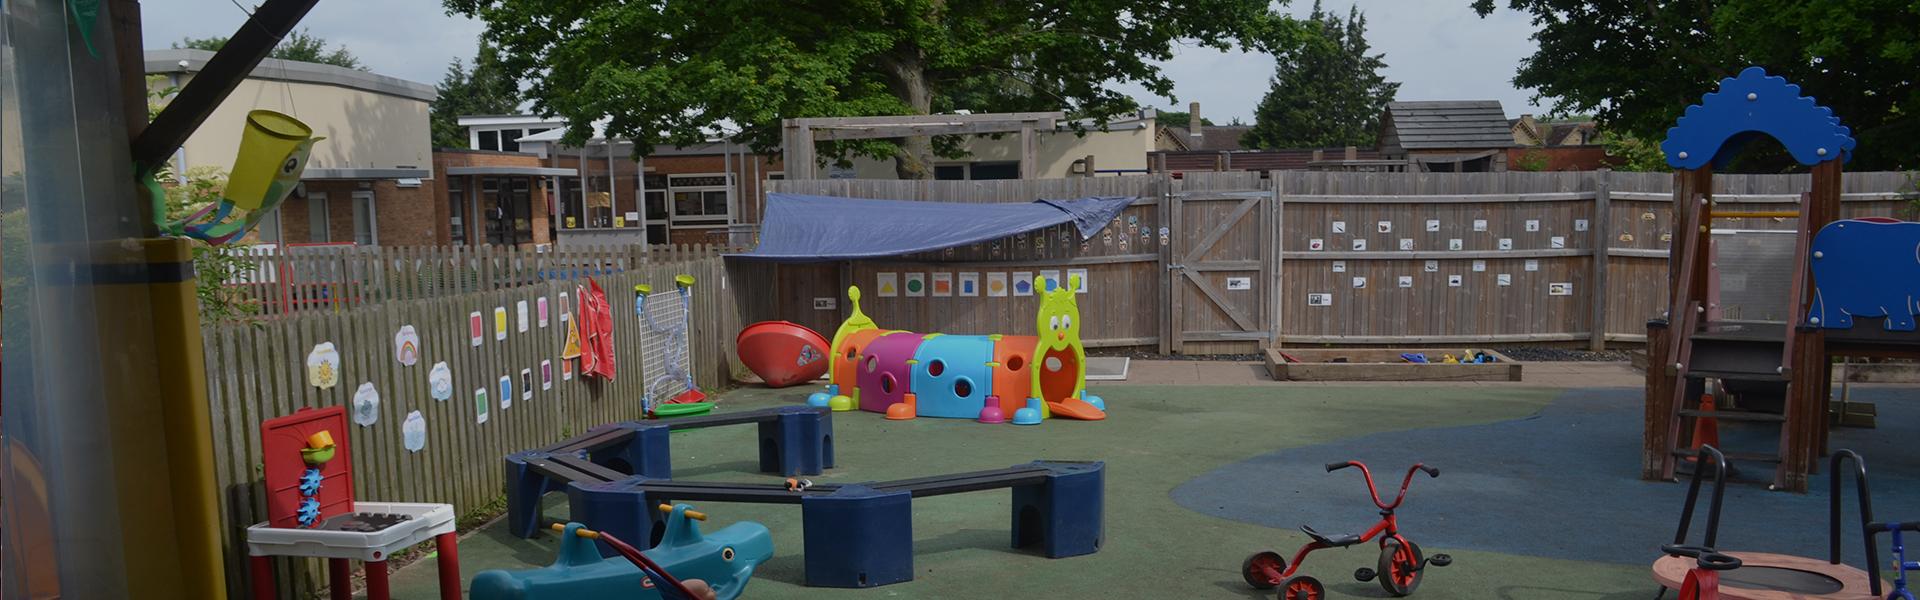 Our Acorn Pre-School